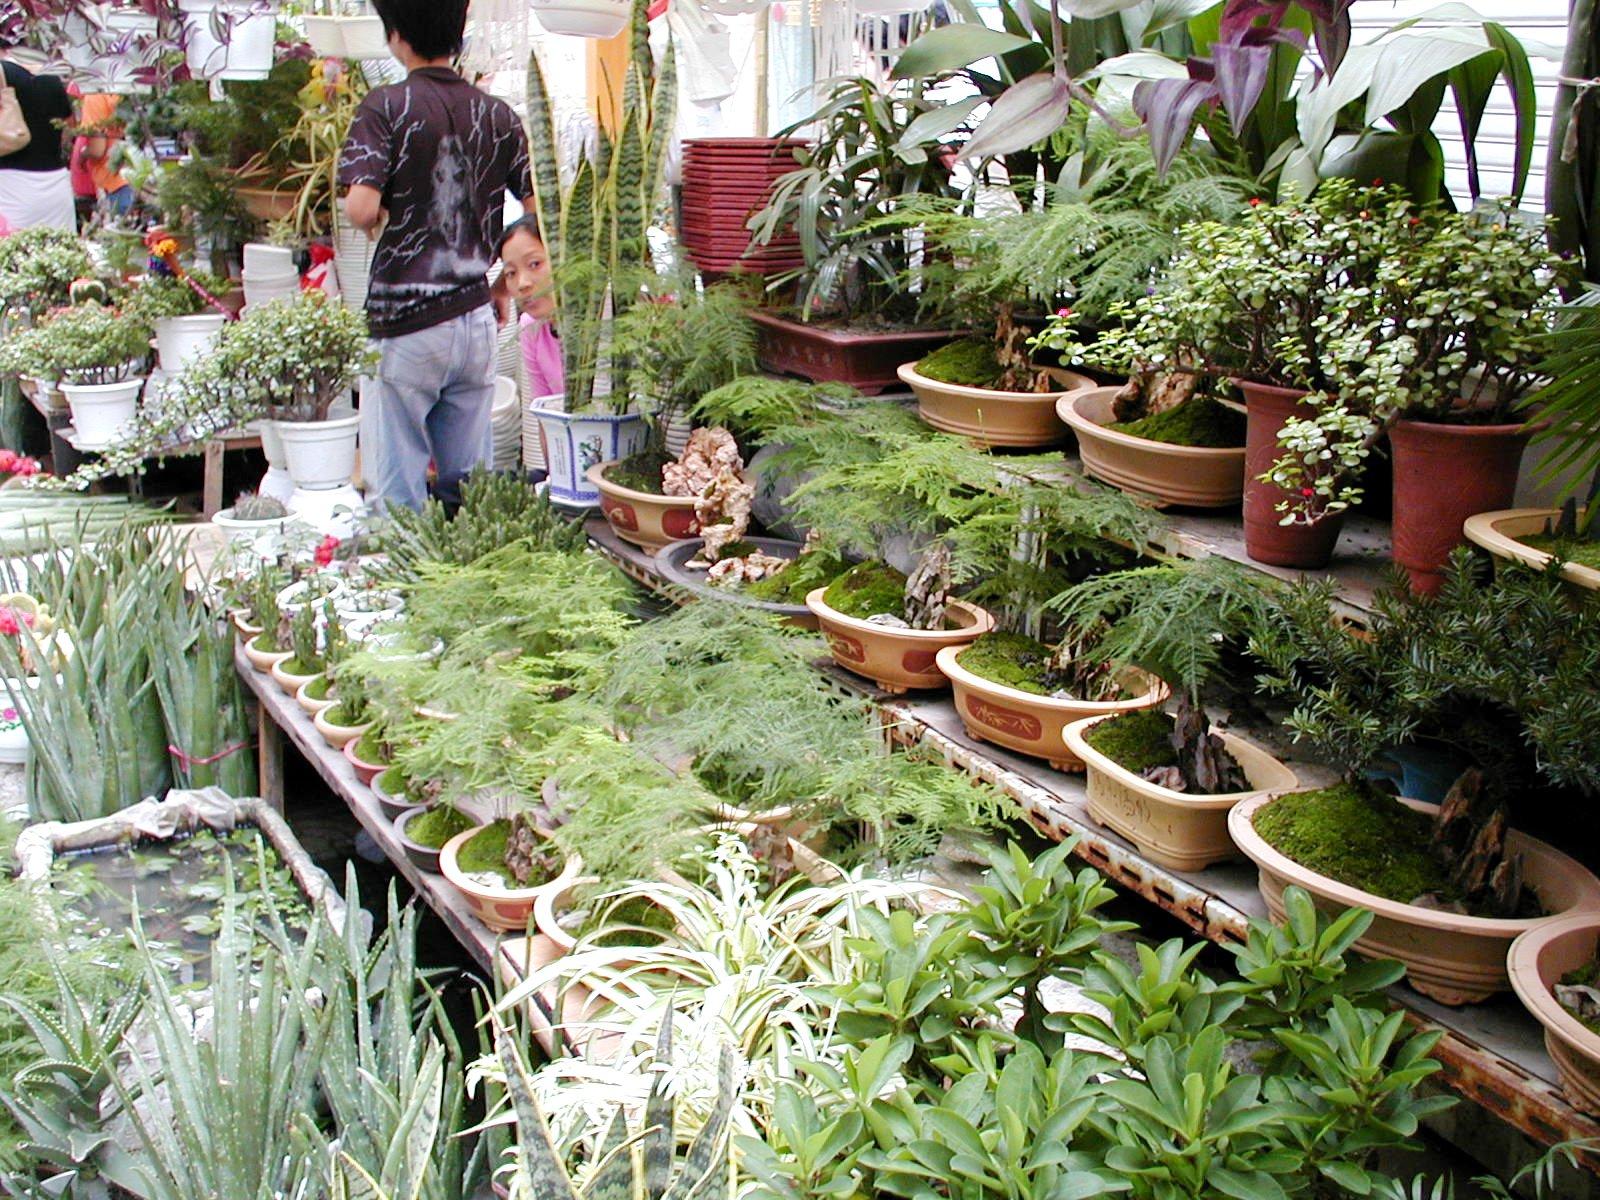 蘇州の花市場